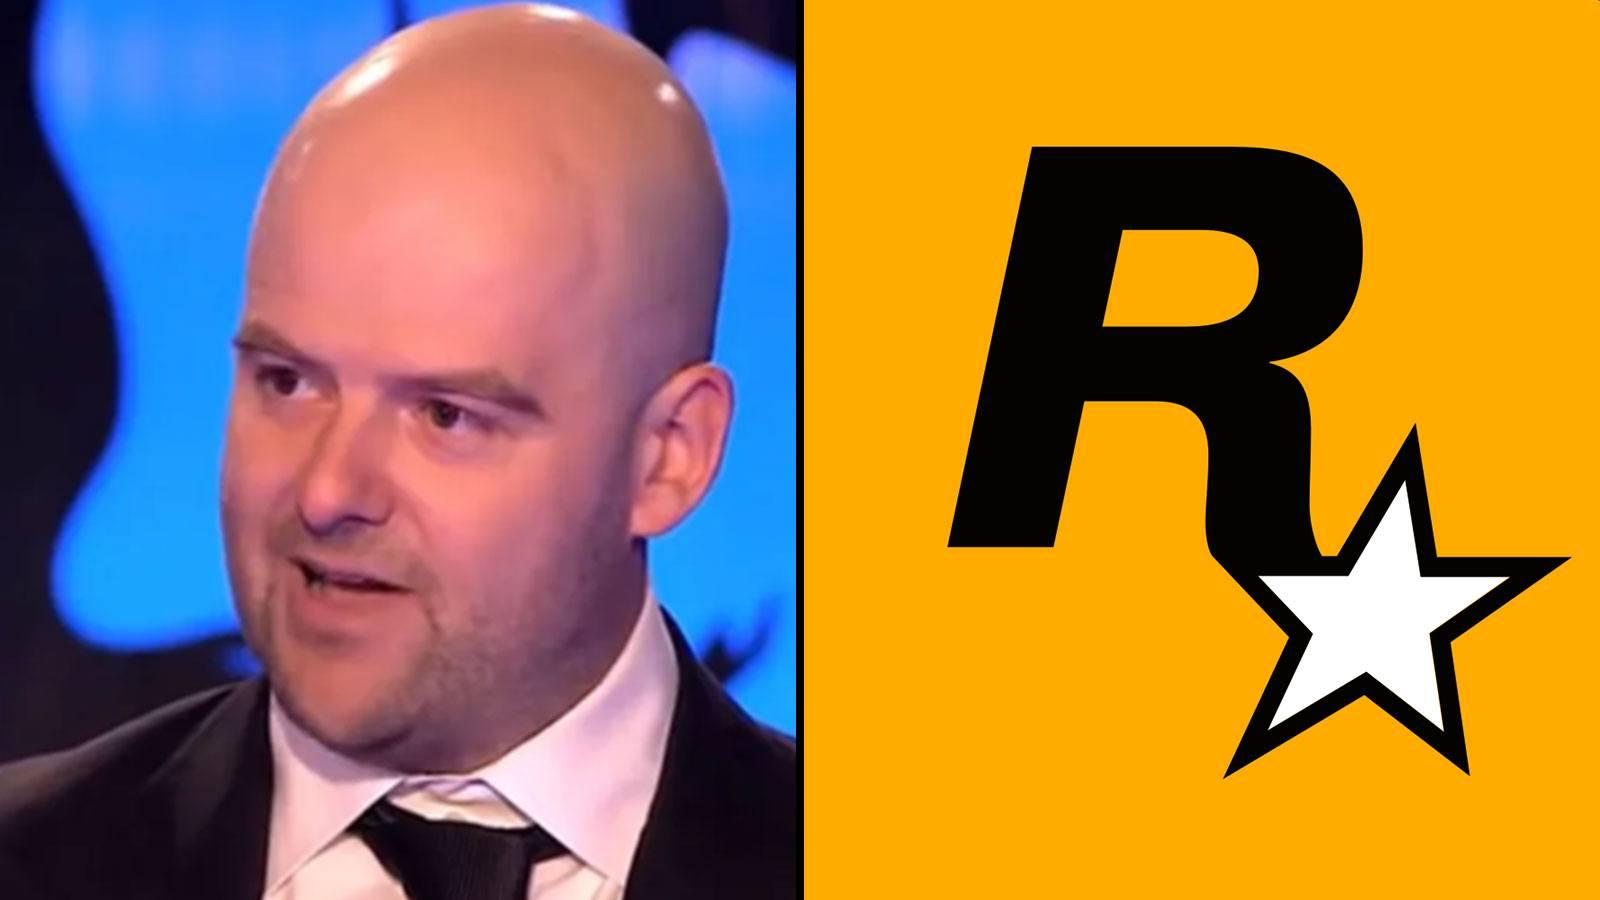 Dan Houser logo Rockstar Games